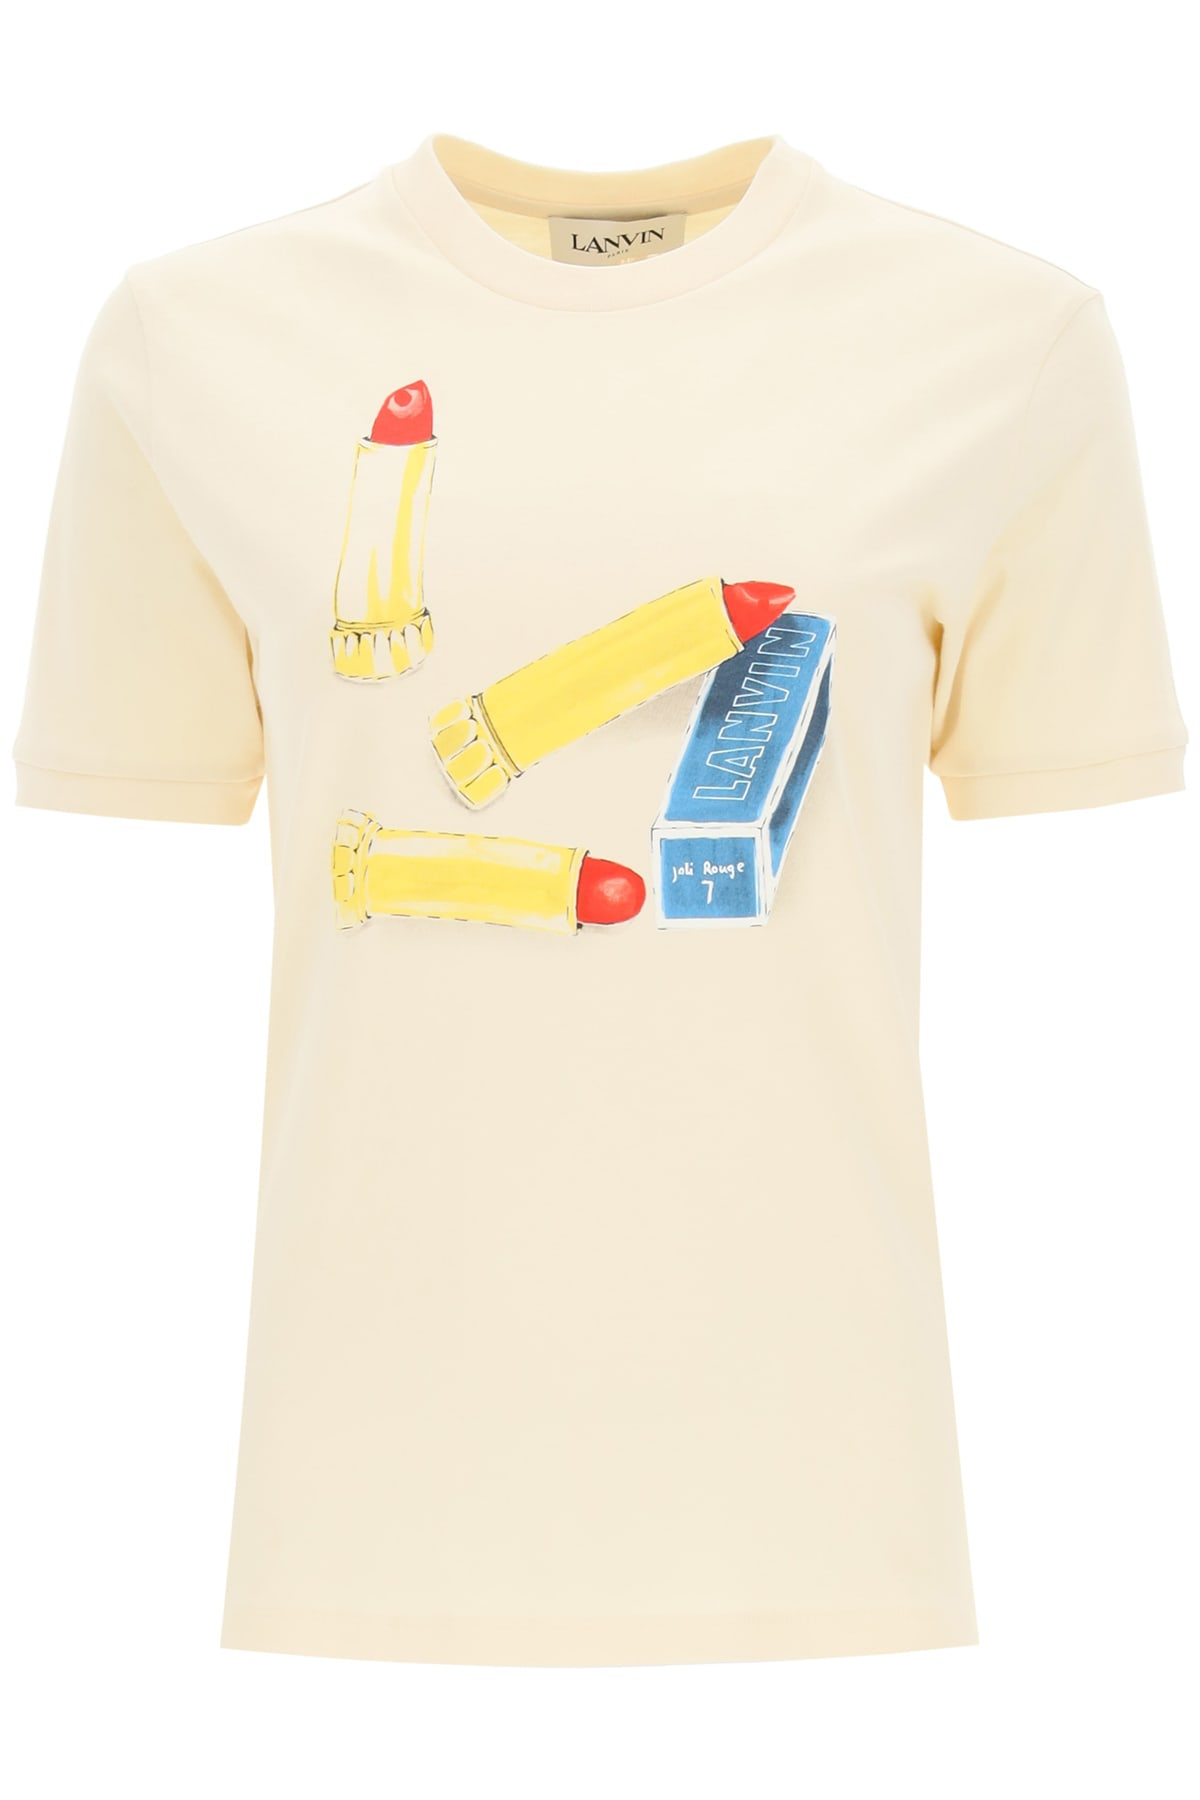 Lanvin T-shirts LIPSTICK PRINT T-SHIRT